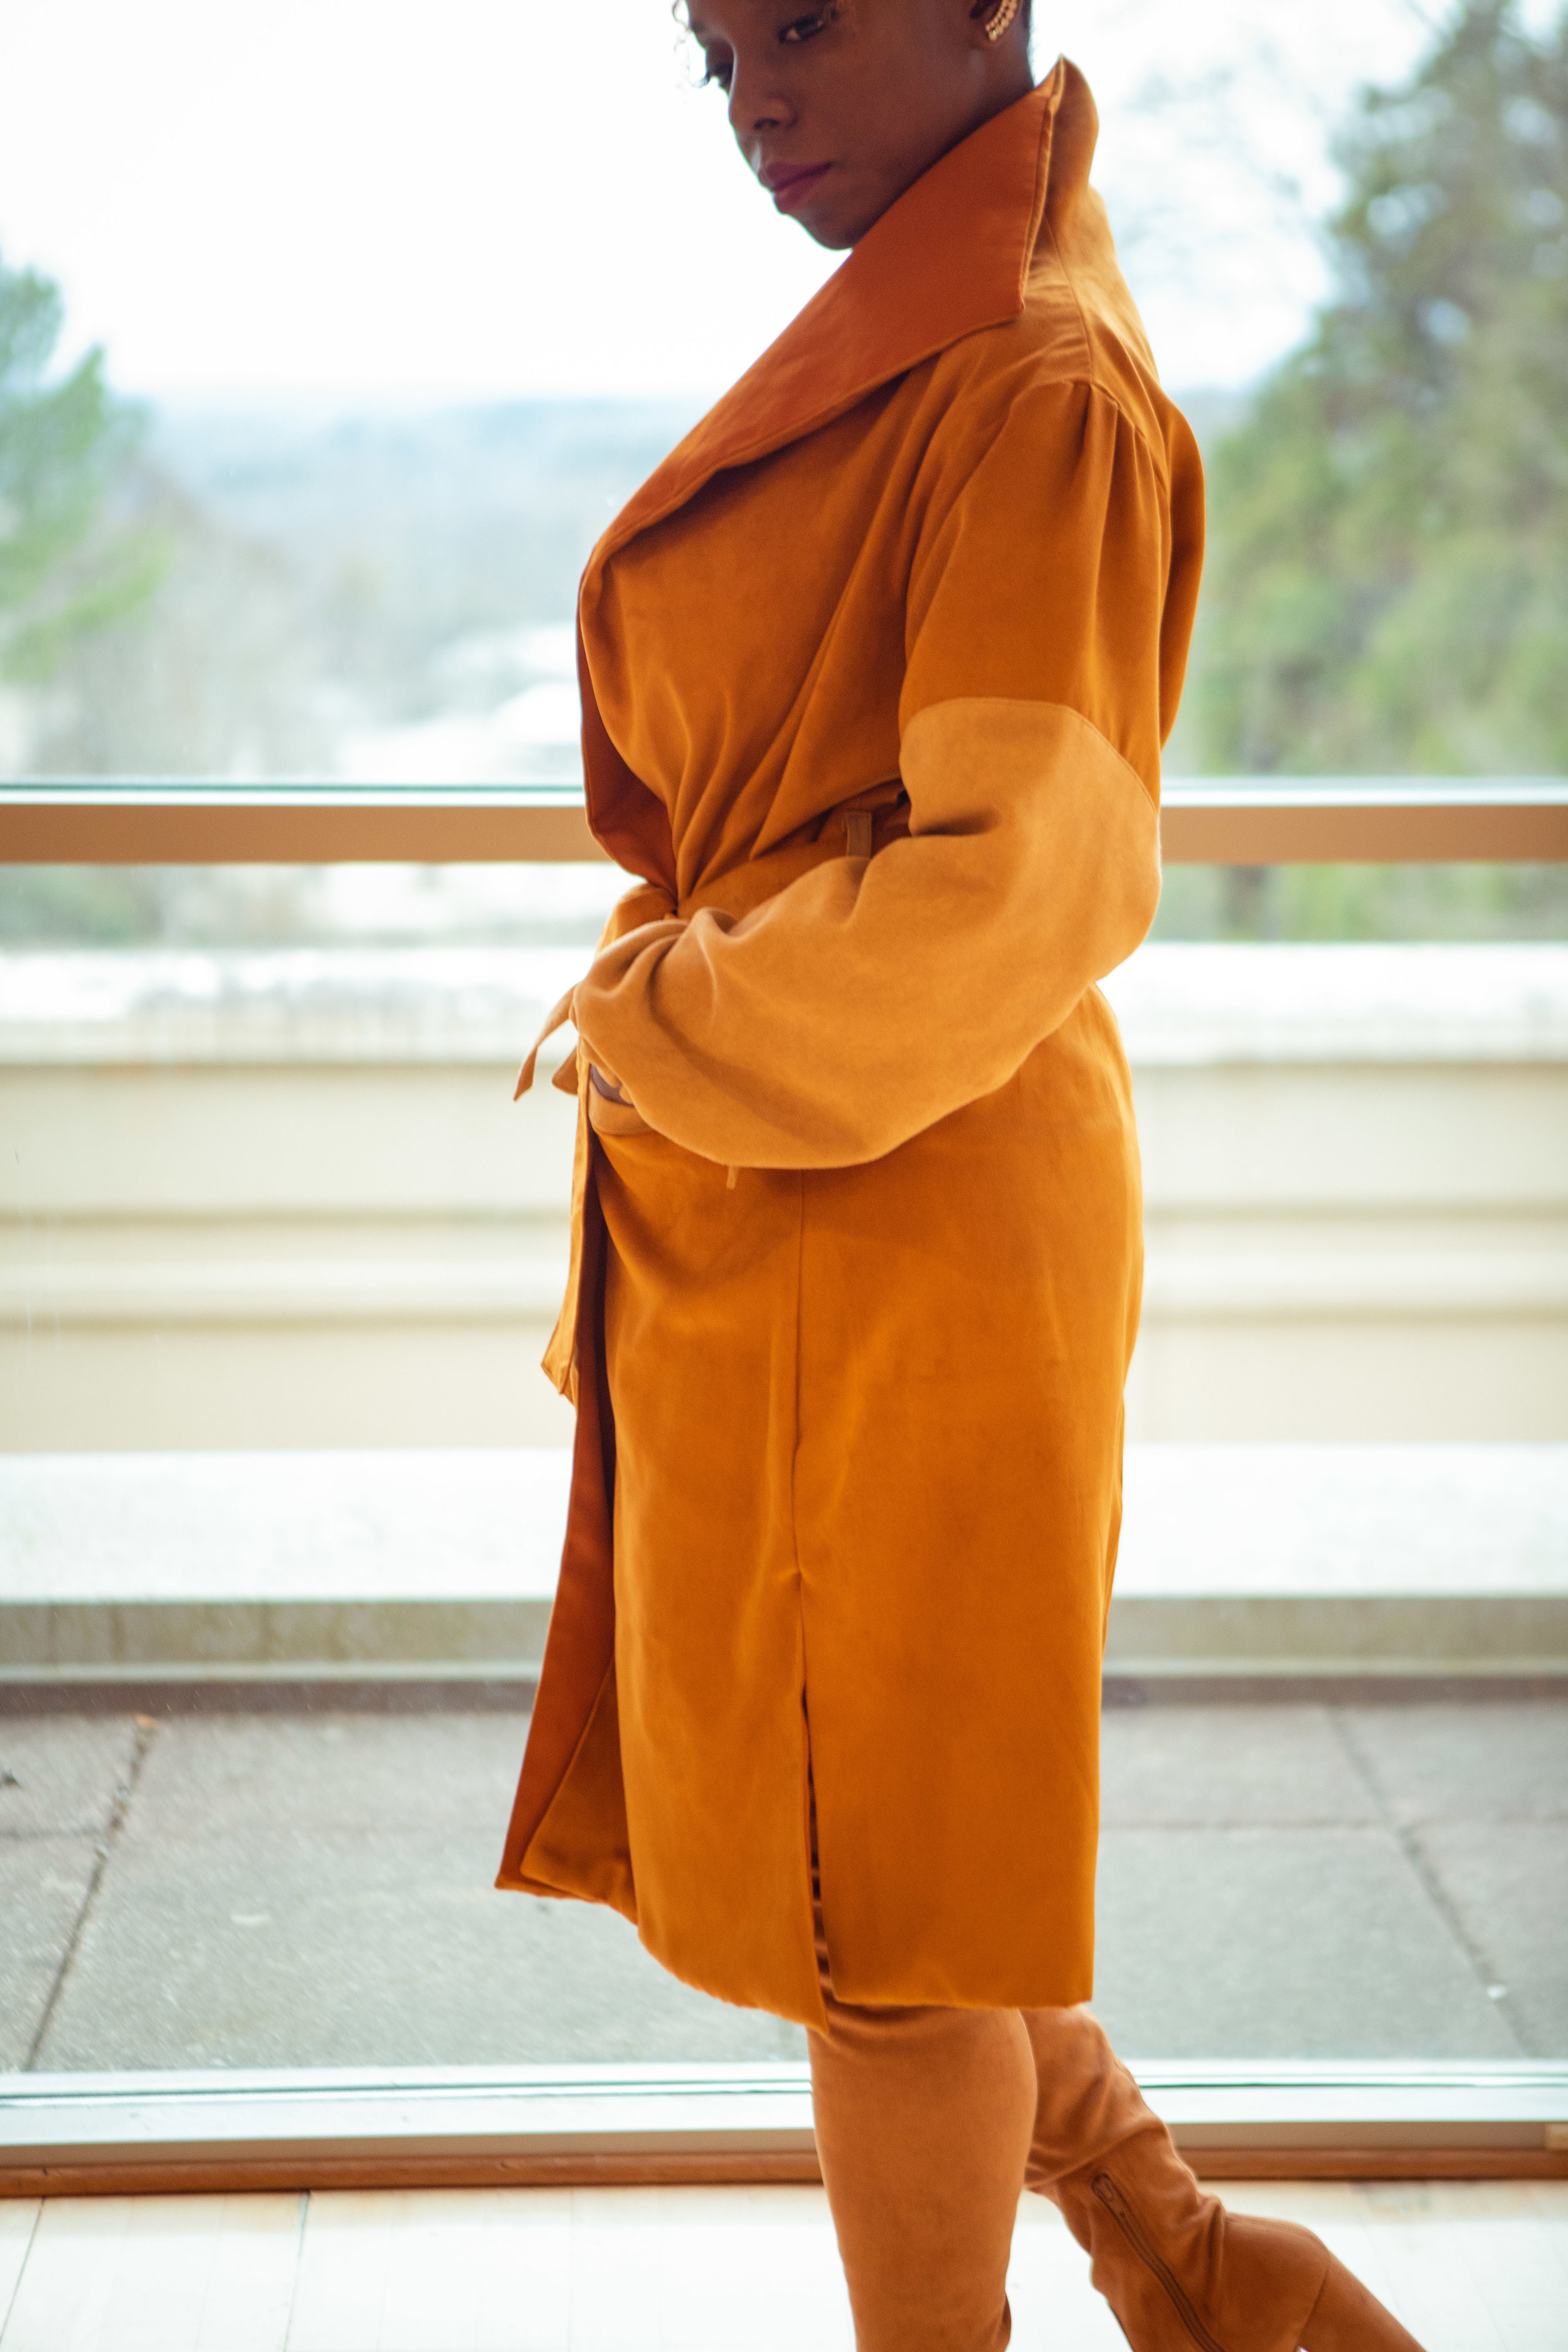 Short Term Goal Of A Fashion Designer Tabitha Fielteau